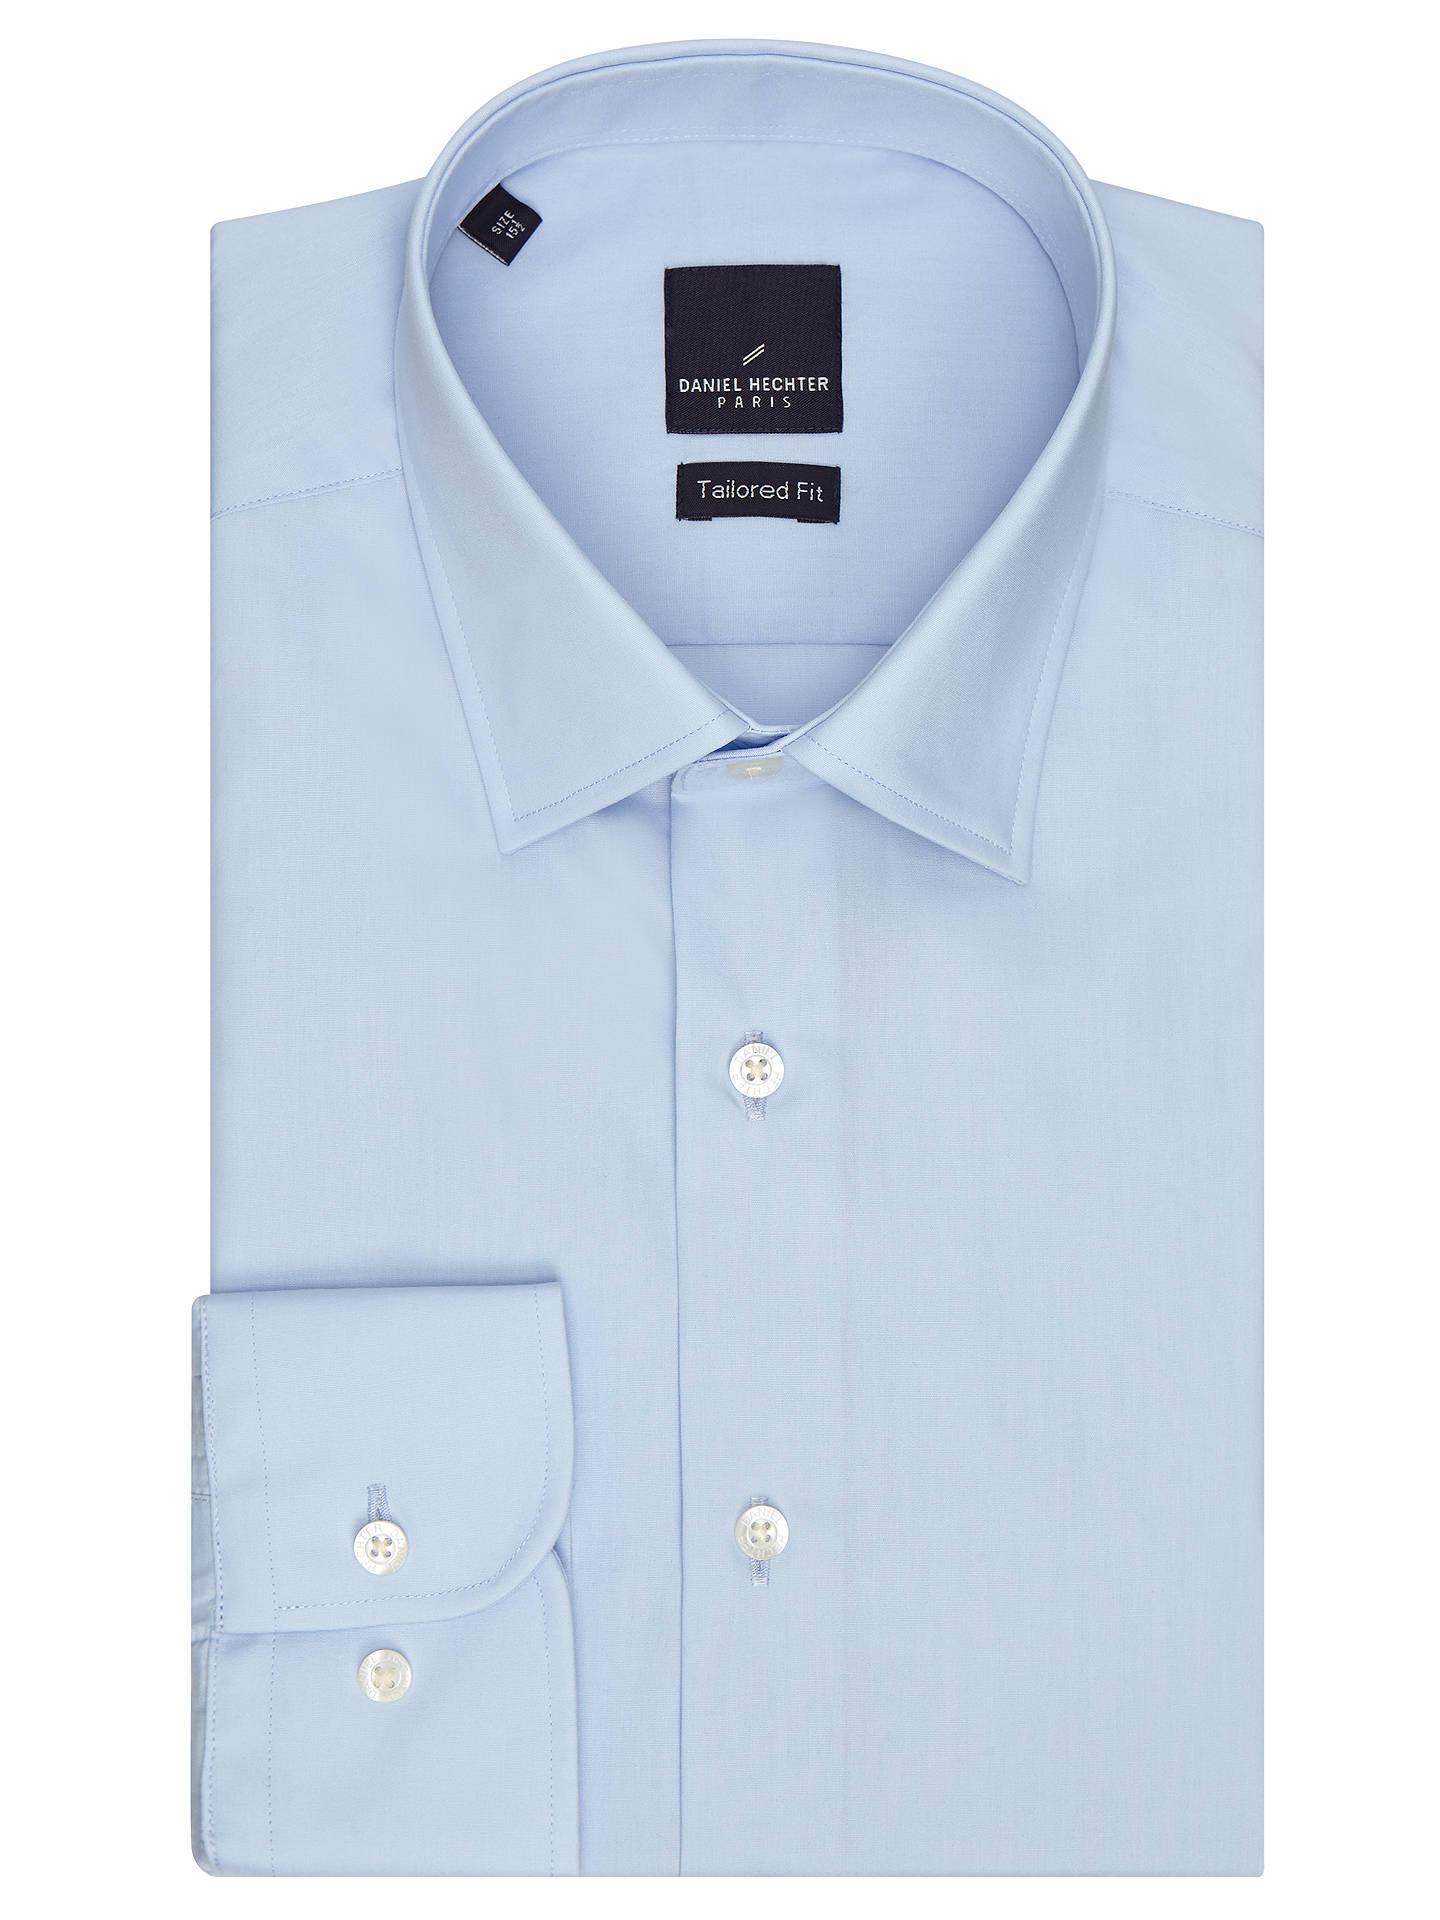 on sale 6951f 1deae Daniel Hechter Poplin Shirt at John Lewis & Partners